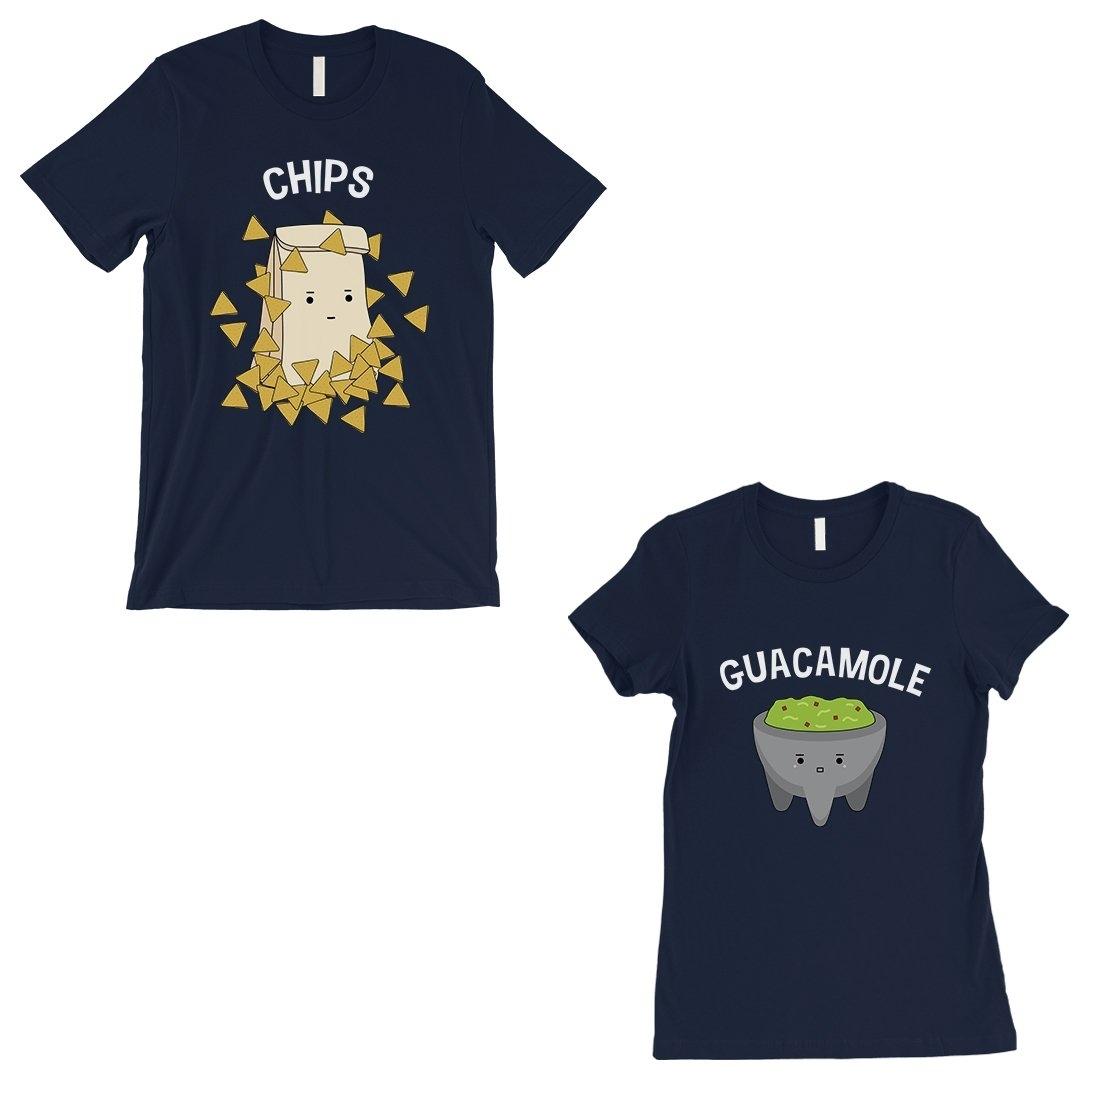 Wedding Gifts At Walmart: Chips & Guacamole Matching Couple Gift